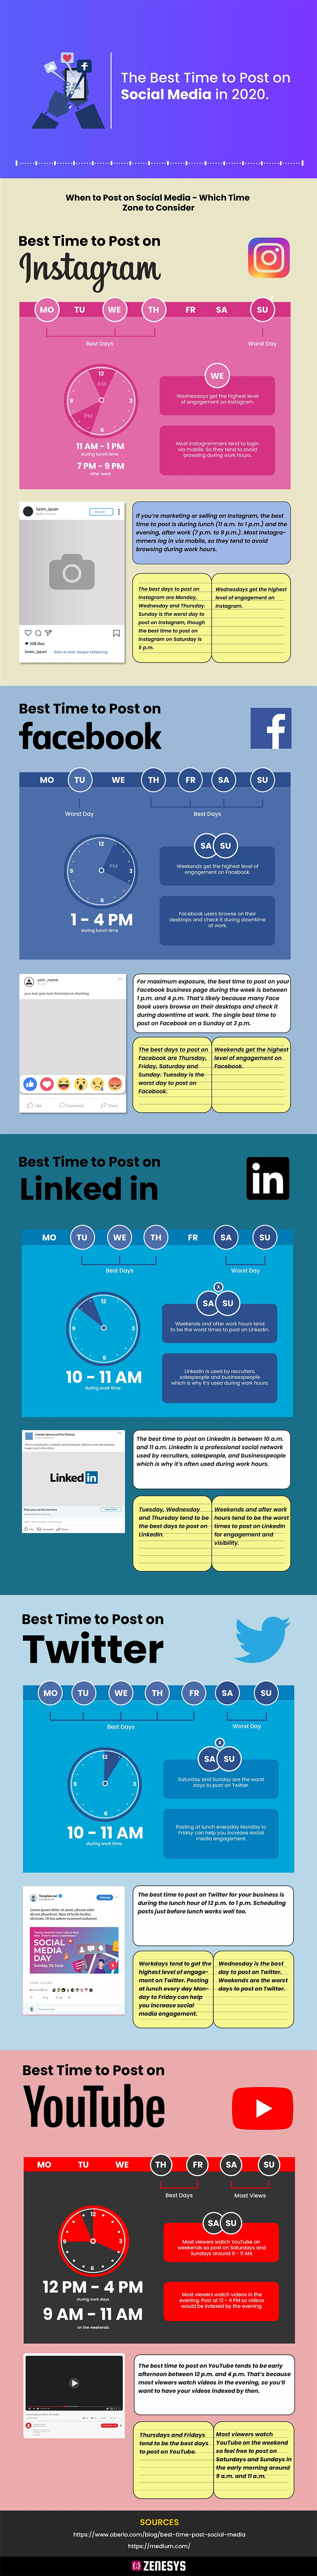 Social media best posting times